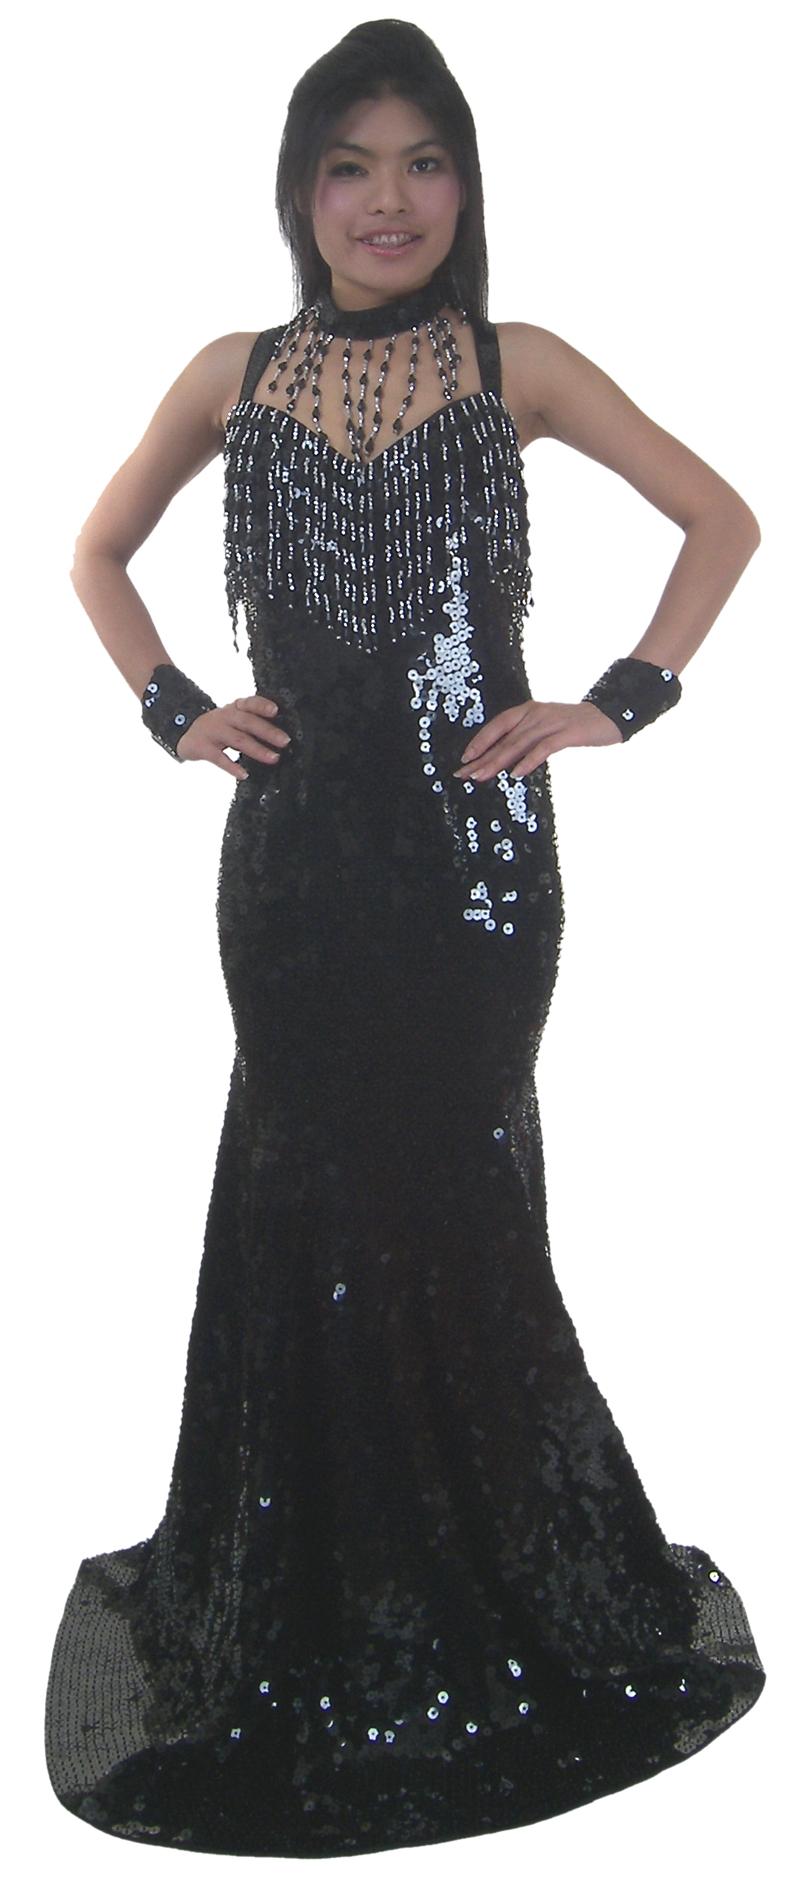 https://michaeljacksoncelebrityclothing.com/sequin-ball-gown/TM2012-black-sequin-prom-dress.jpg